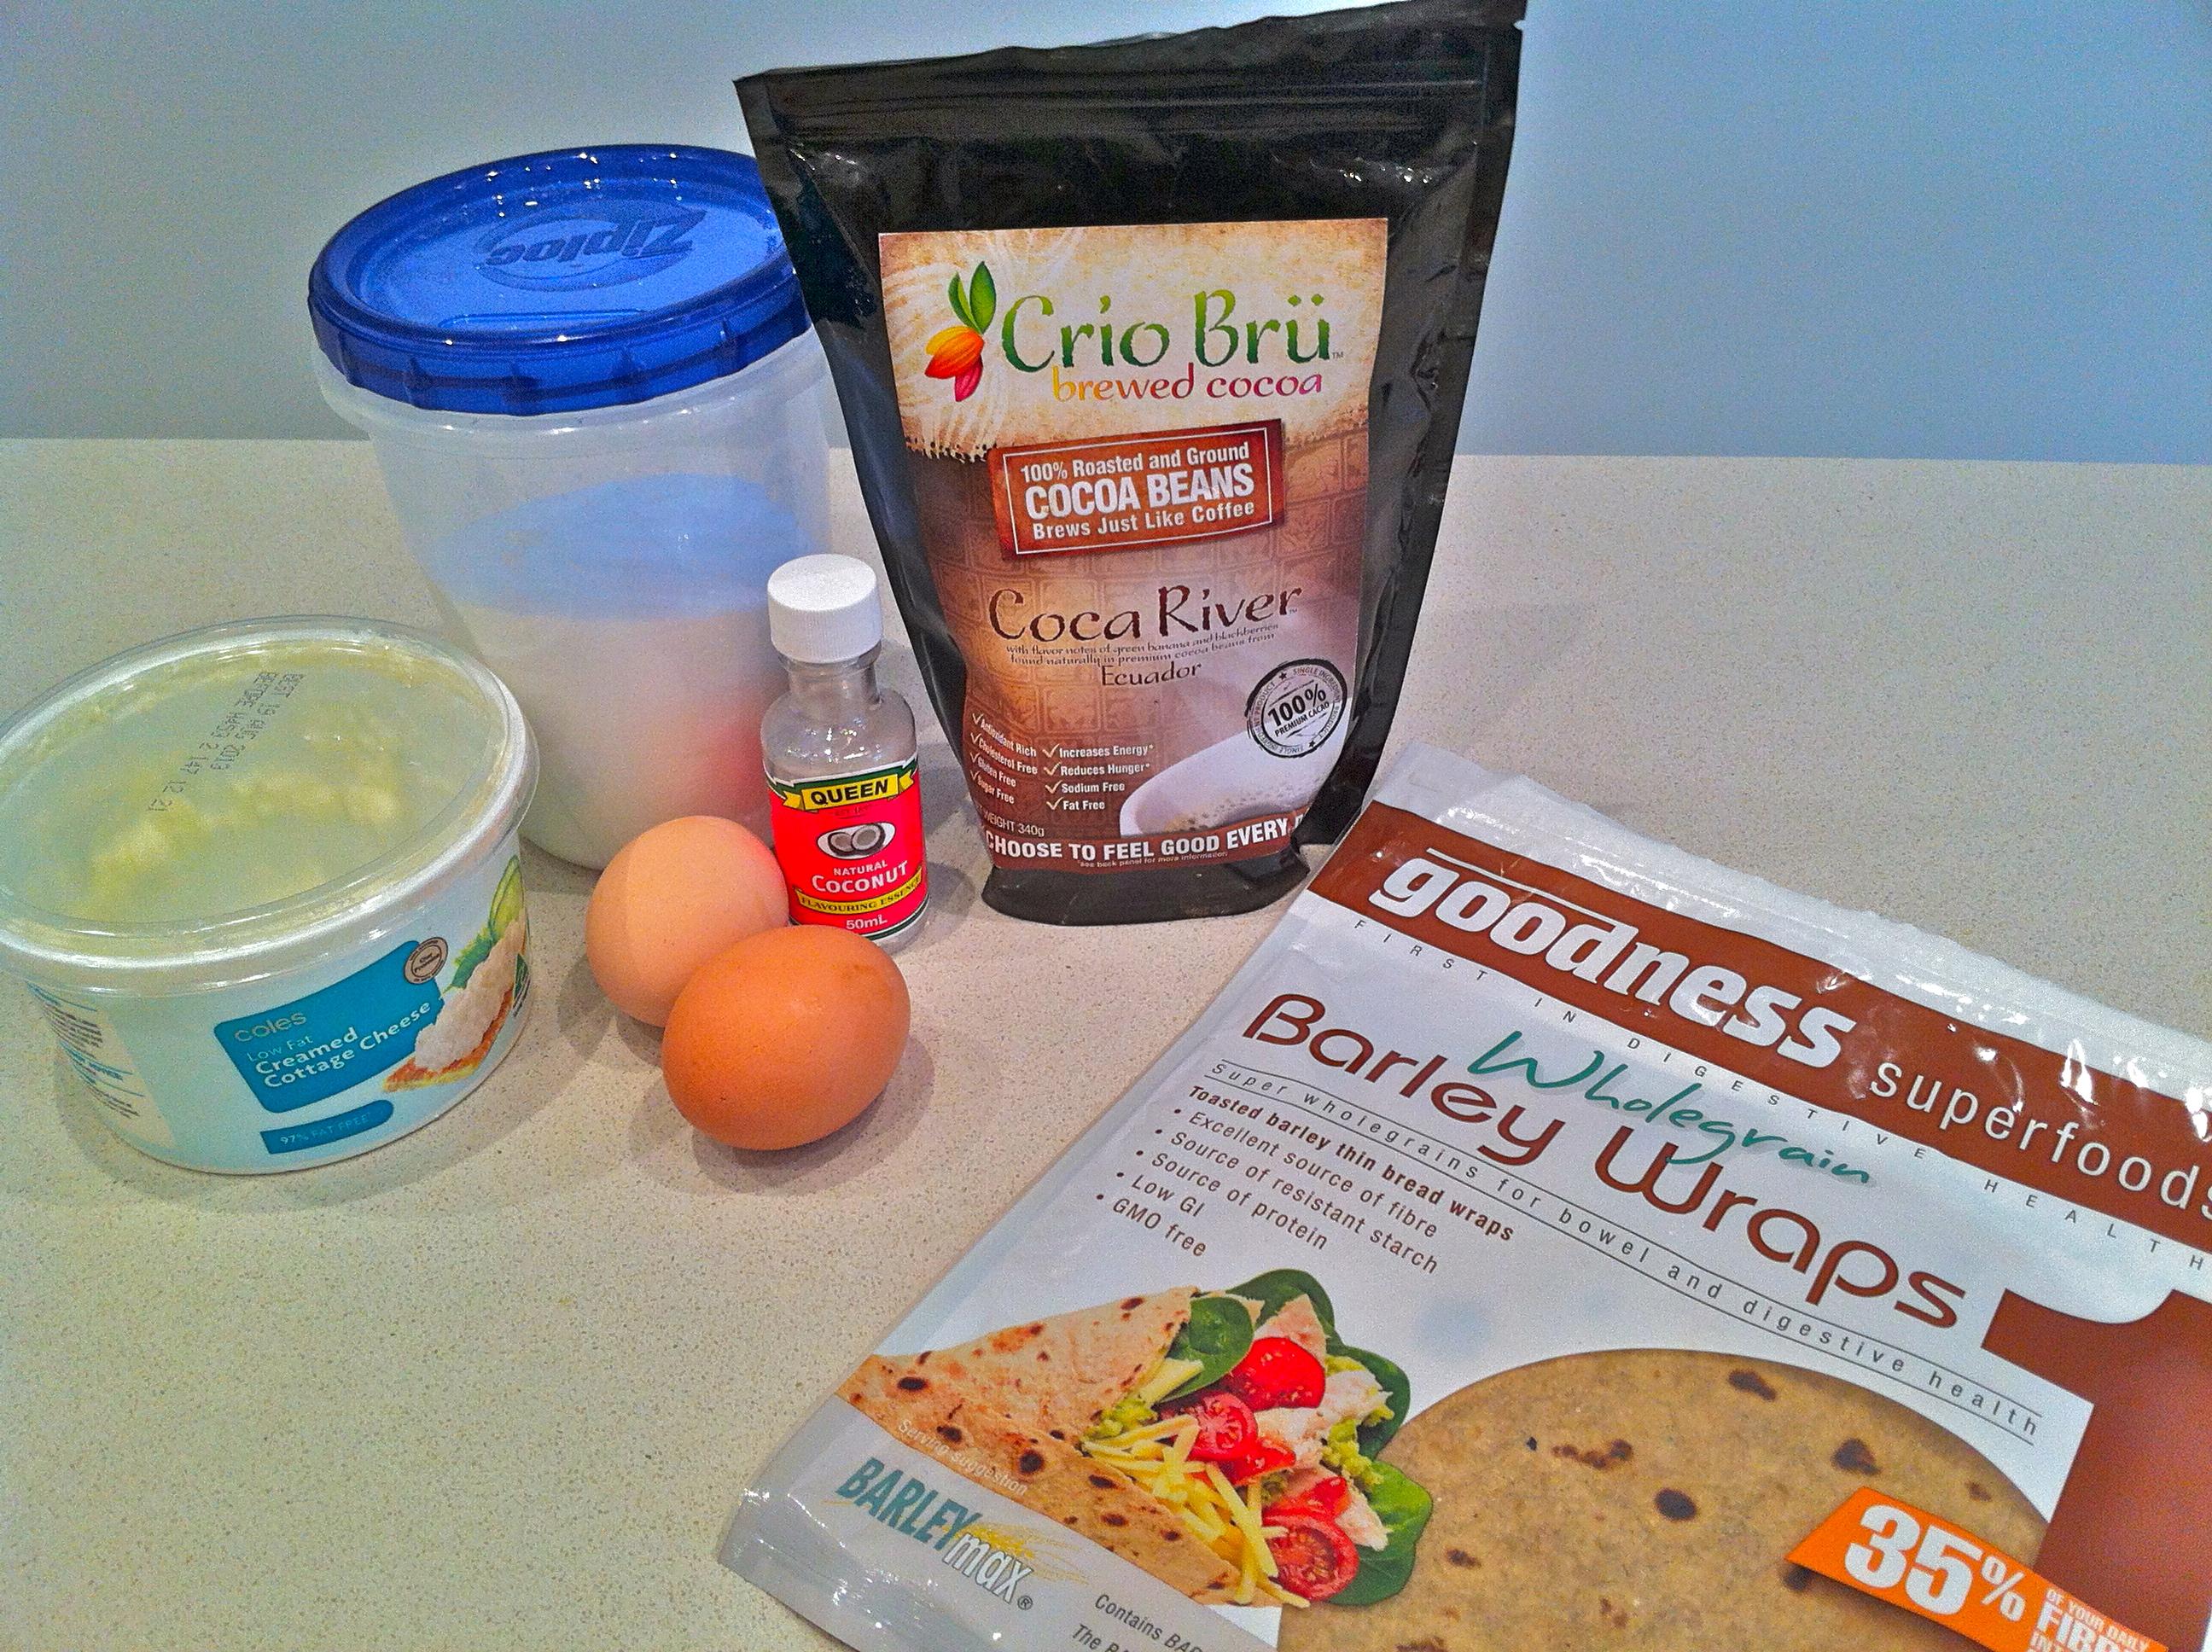 Ingredients: Natvia, Eggs, Crio Bru, Coconut essence, Goodness Superfoods BARLEYmax wrap, cottage